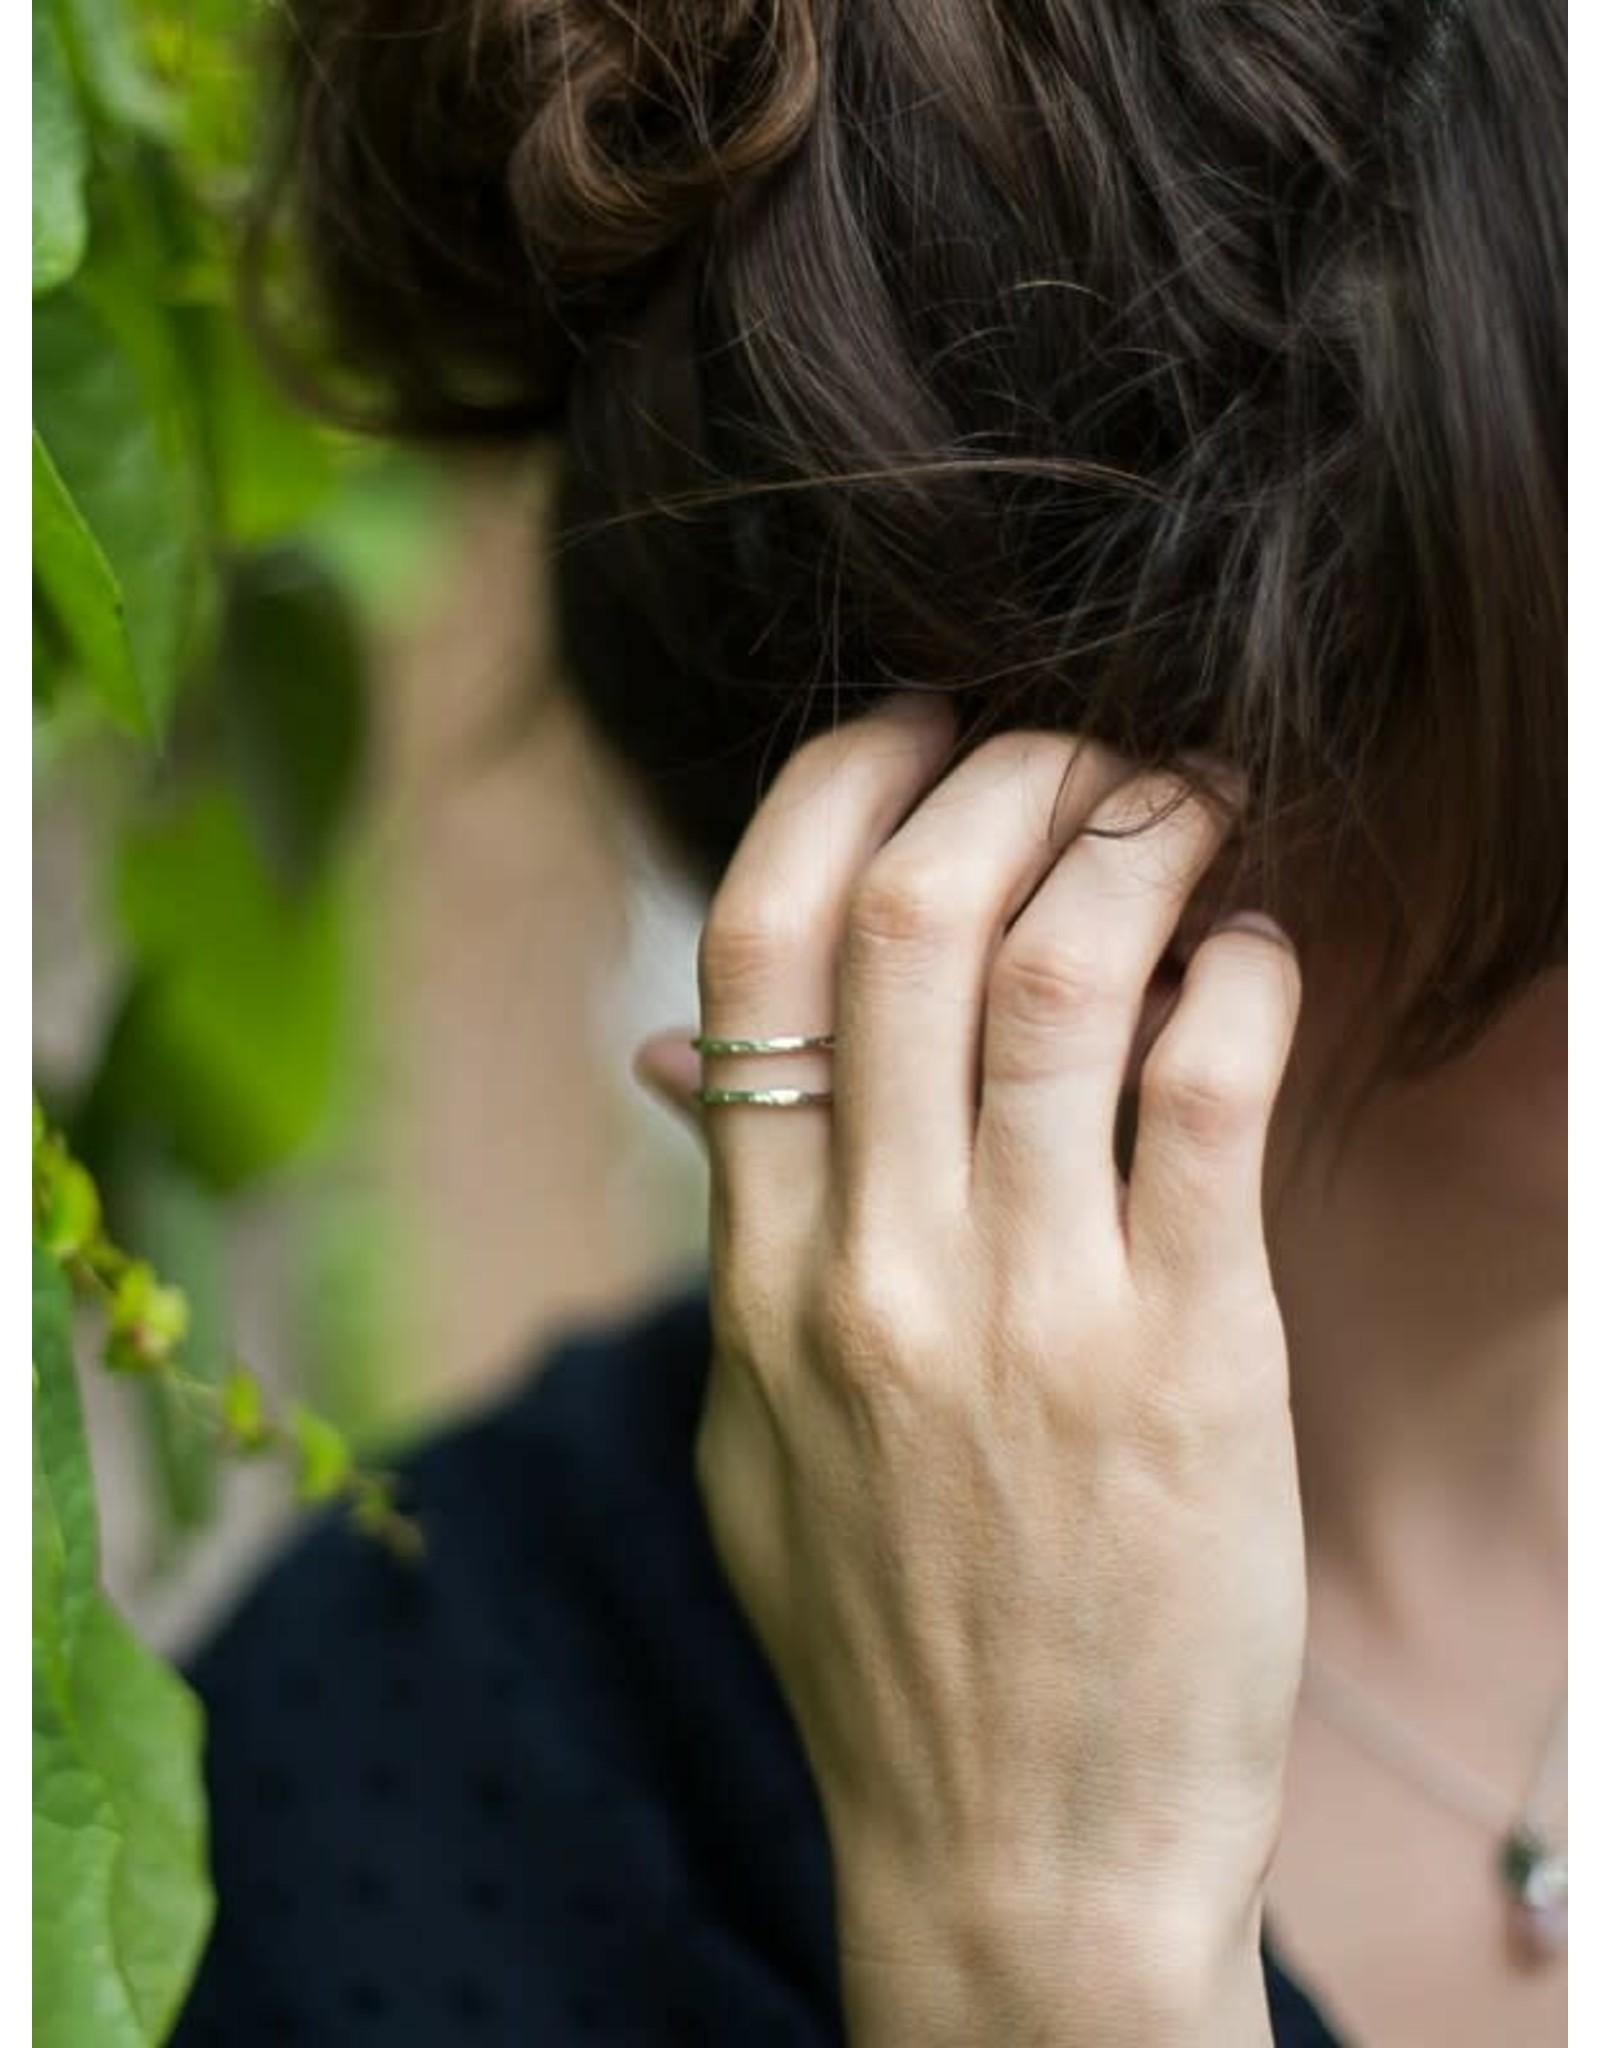 Fair Anita Illusion Ring, Silver-plated. India